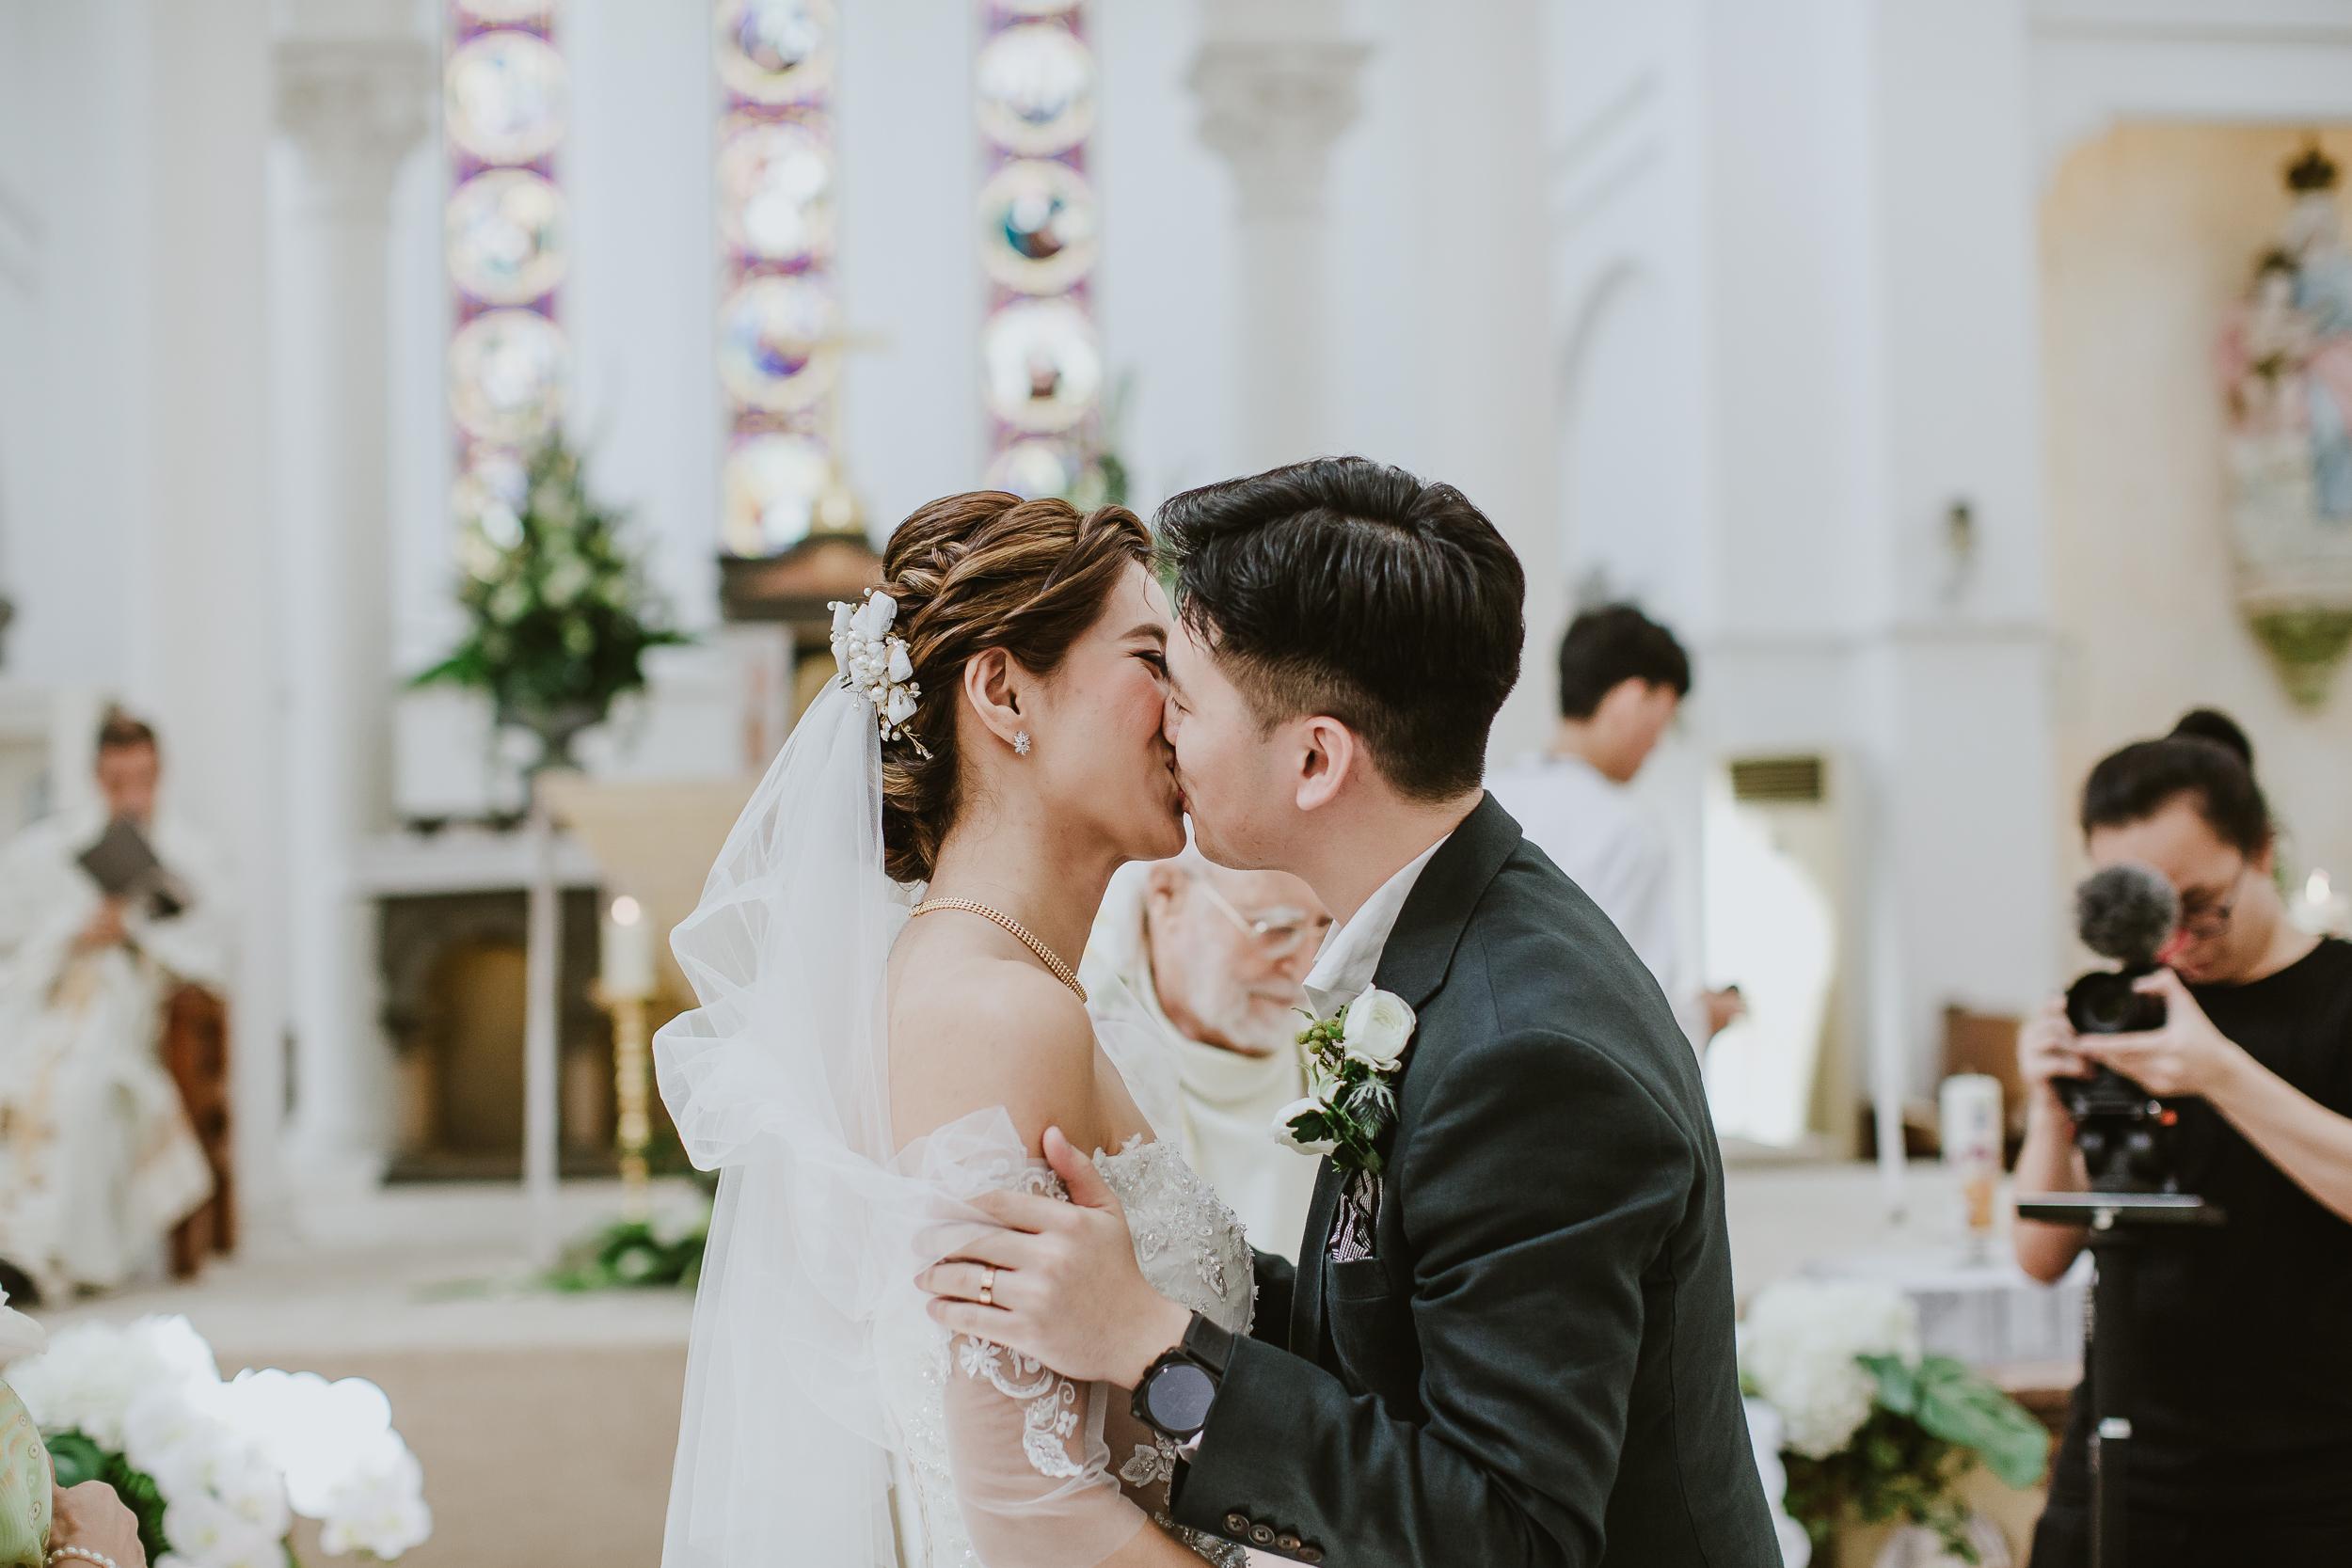 Singapore+Actual+Day+Wedding+Photographer+Raffles+Town+Club+Jeremiah+Christina-0058.jpg